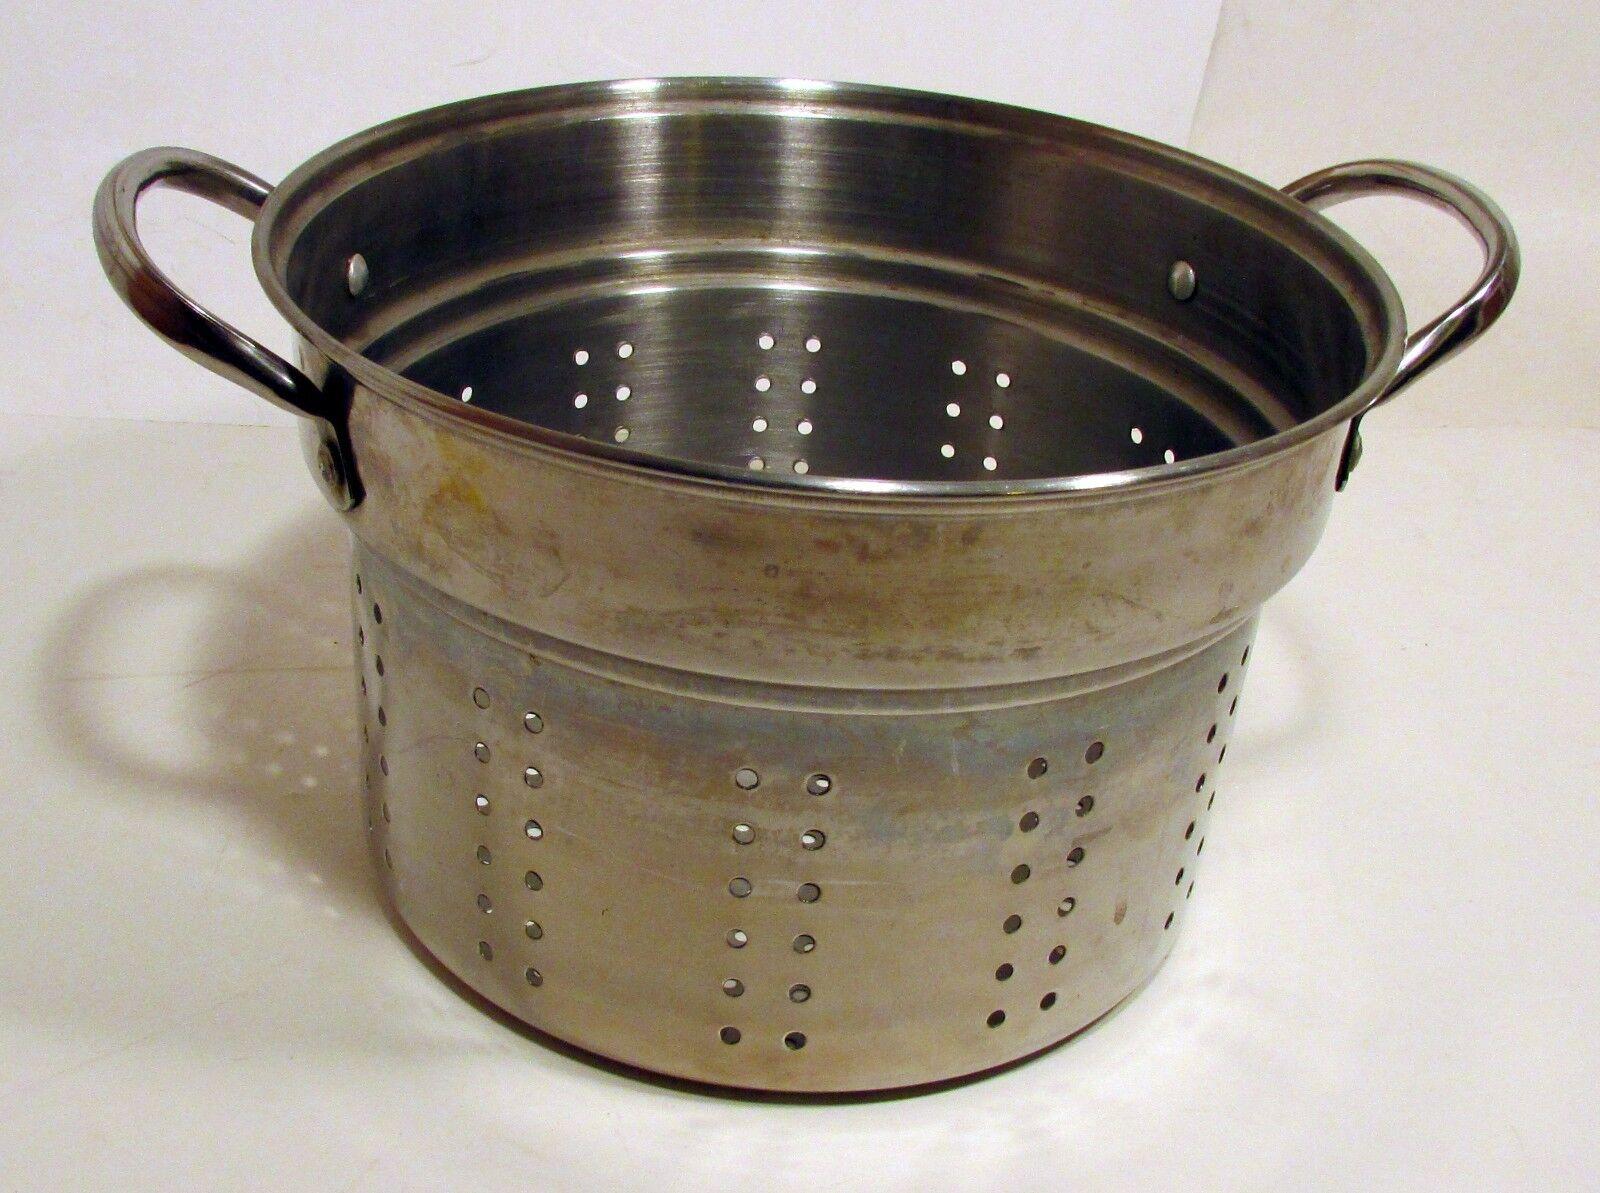 "Stainless Steel Pasta Advertisement Strainer Steamer Colander 6-3/4"" x 10"" Pot boiler"